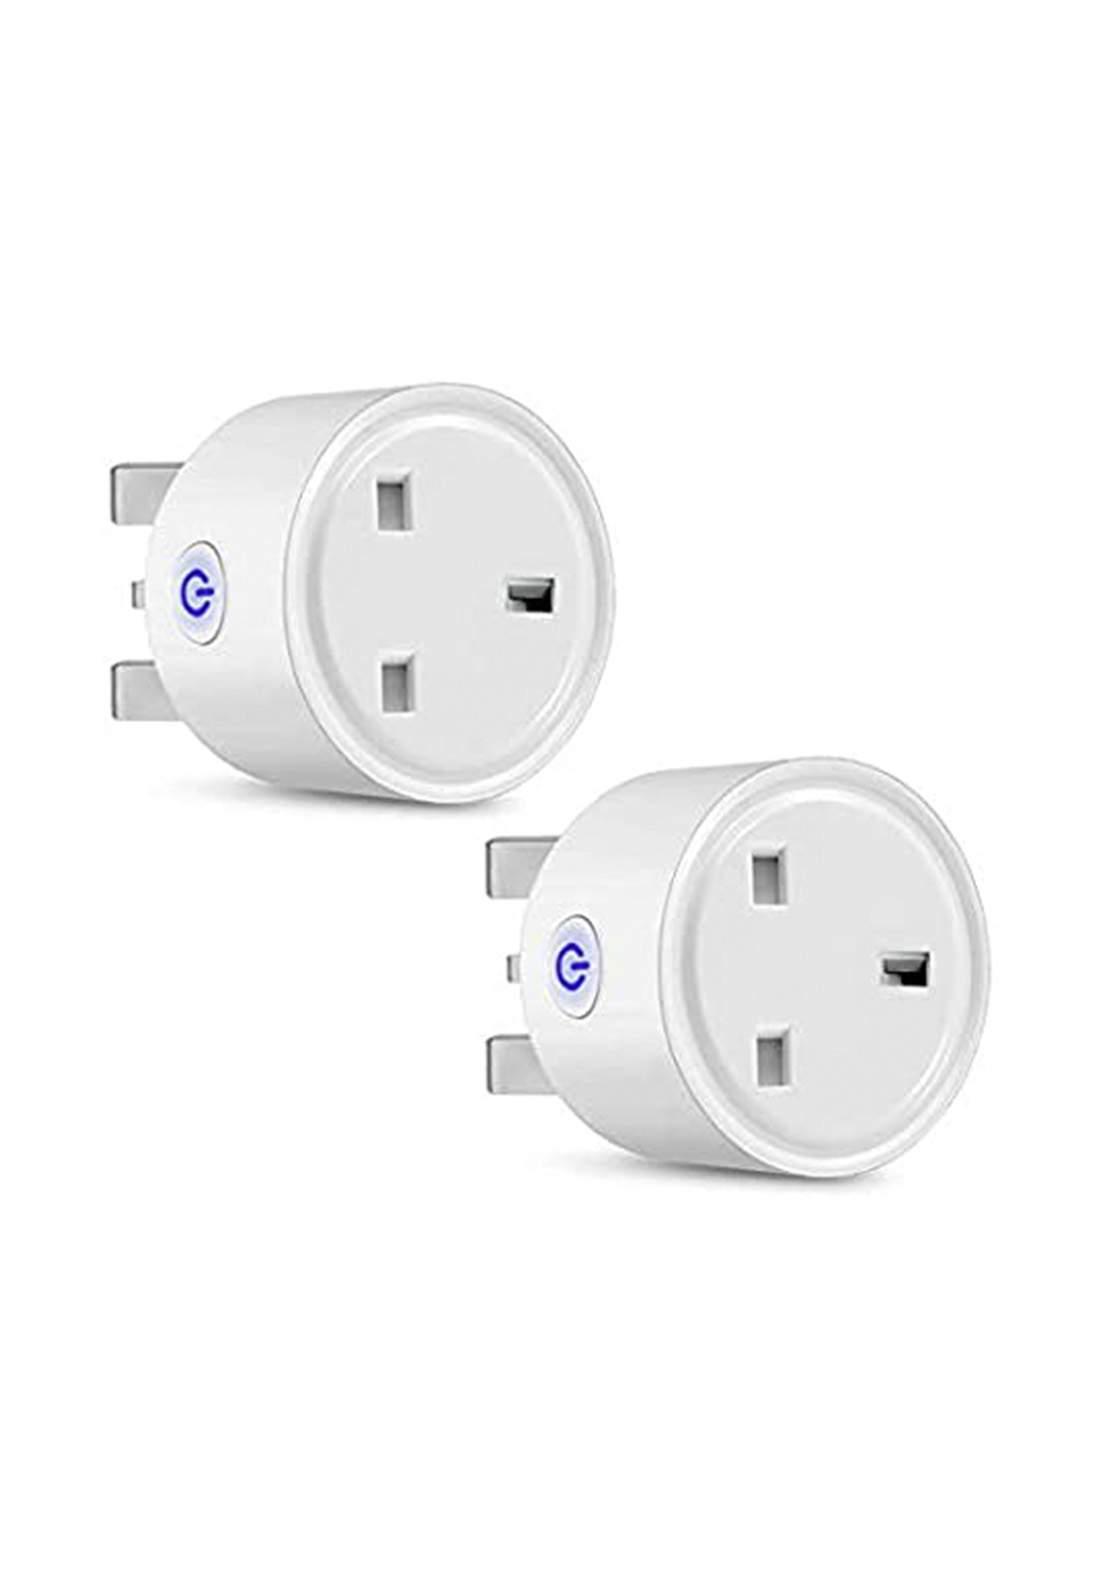 SCT Smart Plug with Power monitoring10A تقسيم ذكي التحكم عن بعد